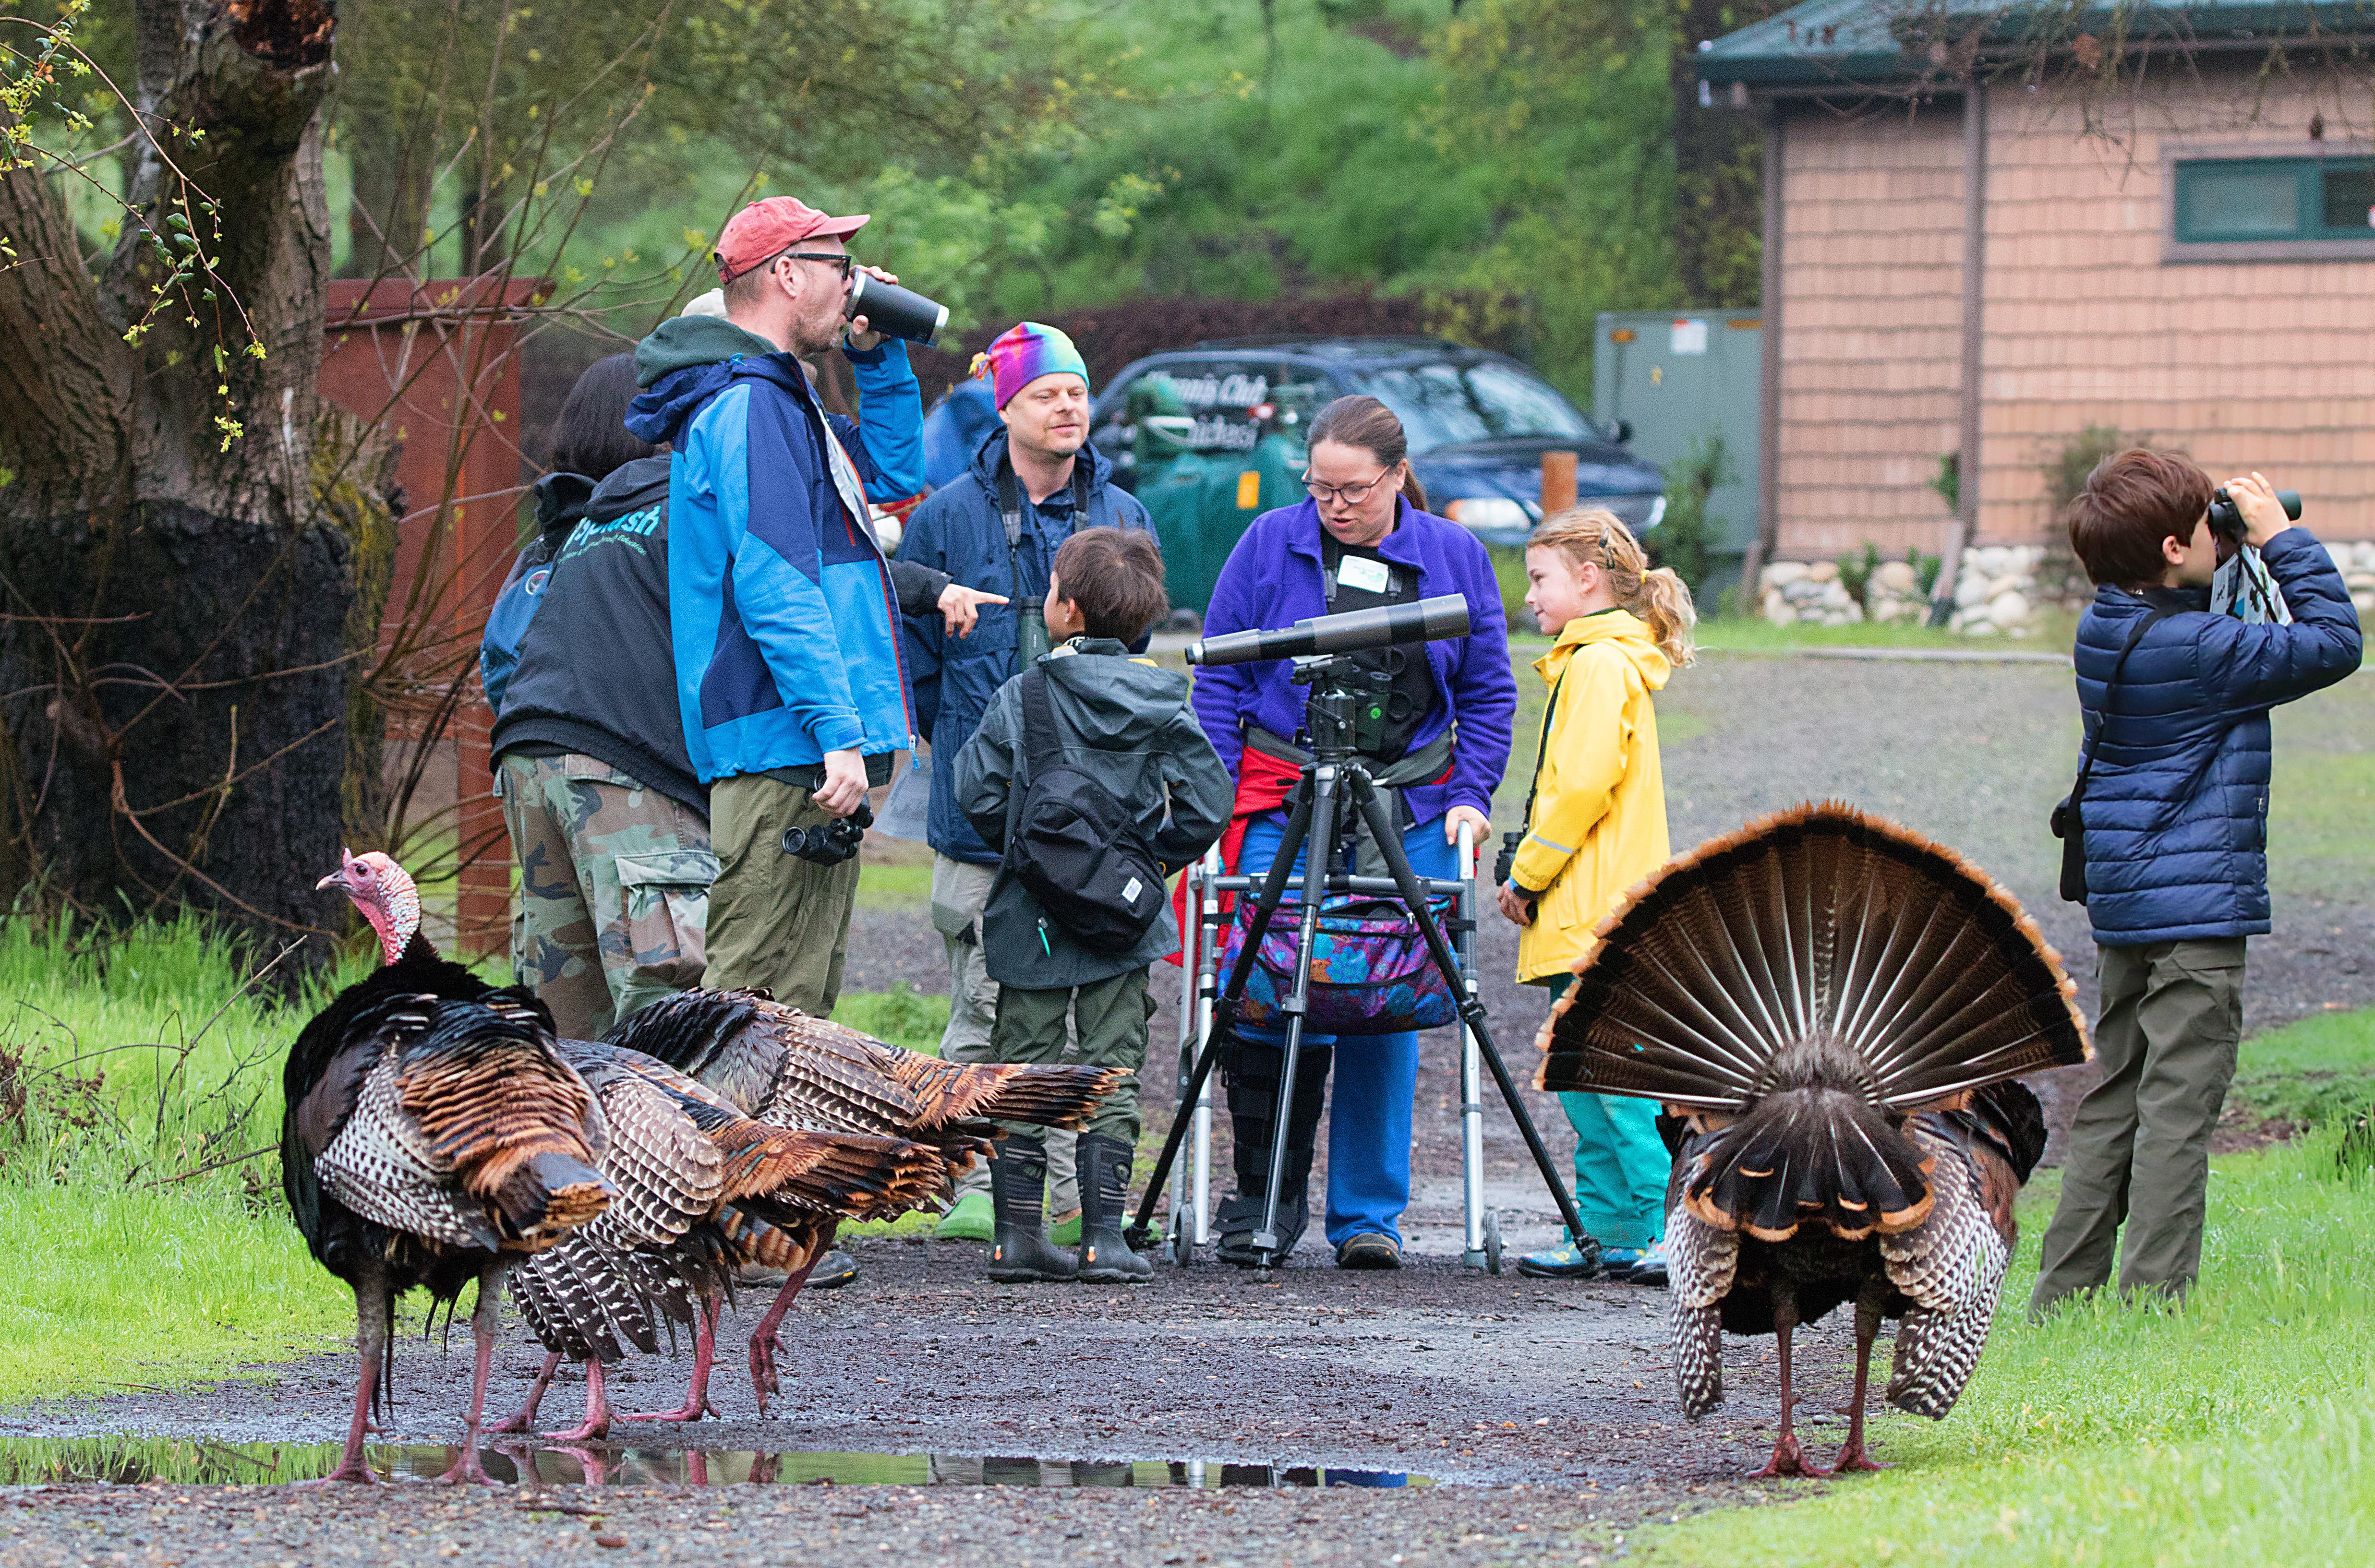 People birding and turkeys people watching